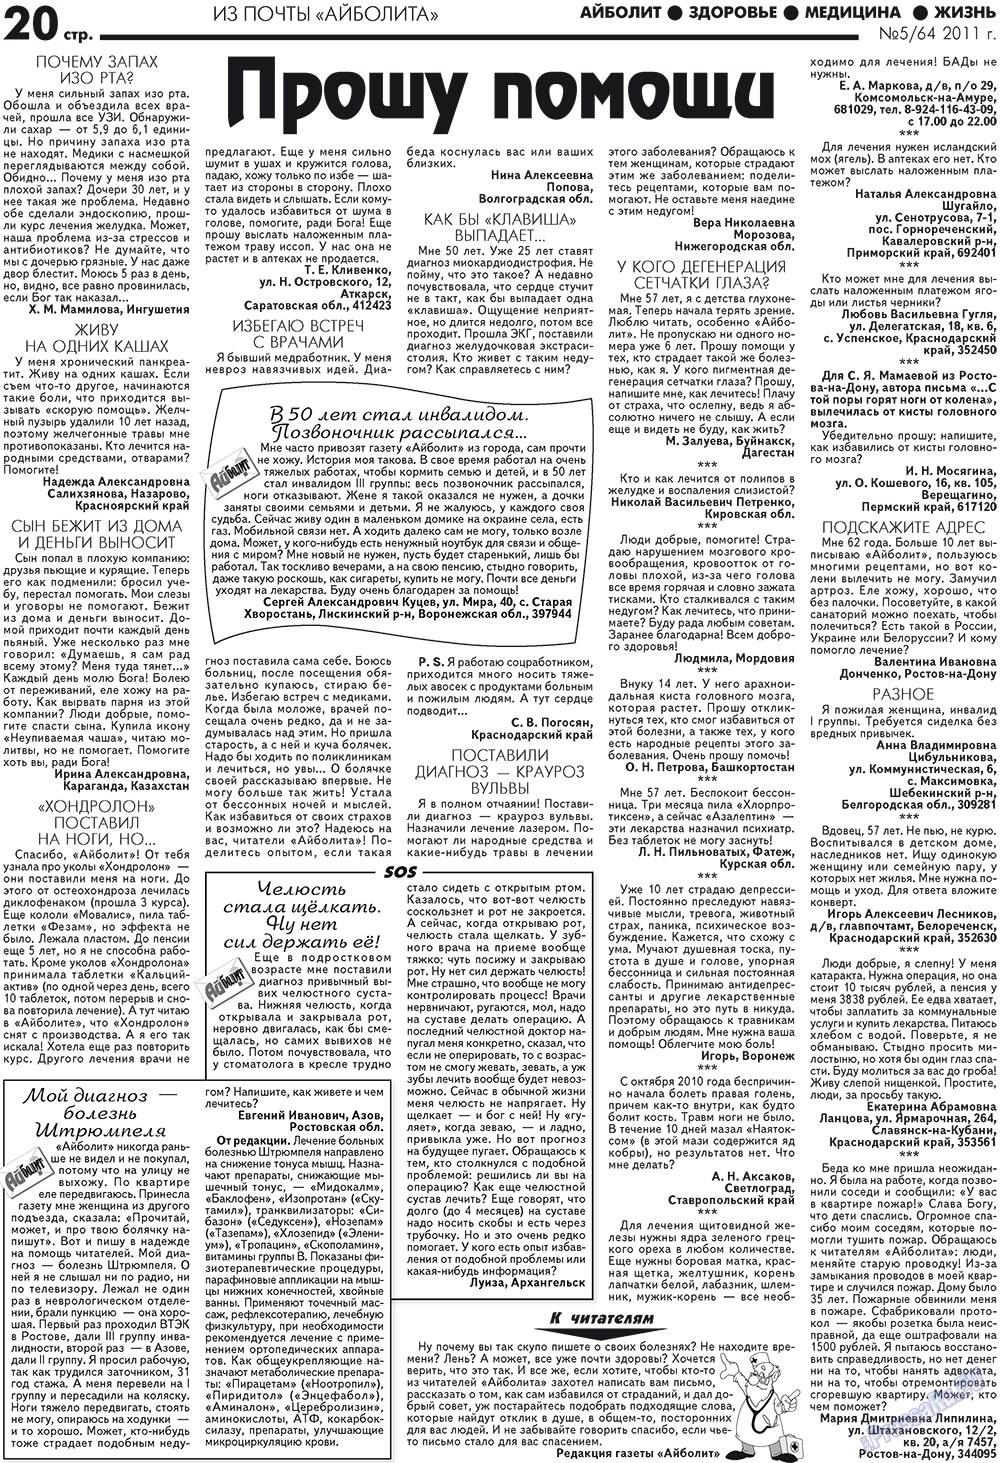 АйБолит (газета). 2011 год, номер 5, стр. 20